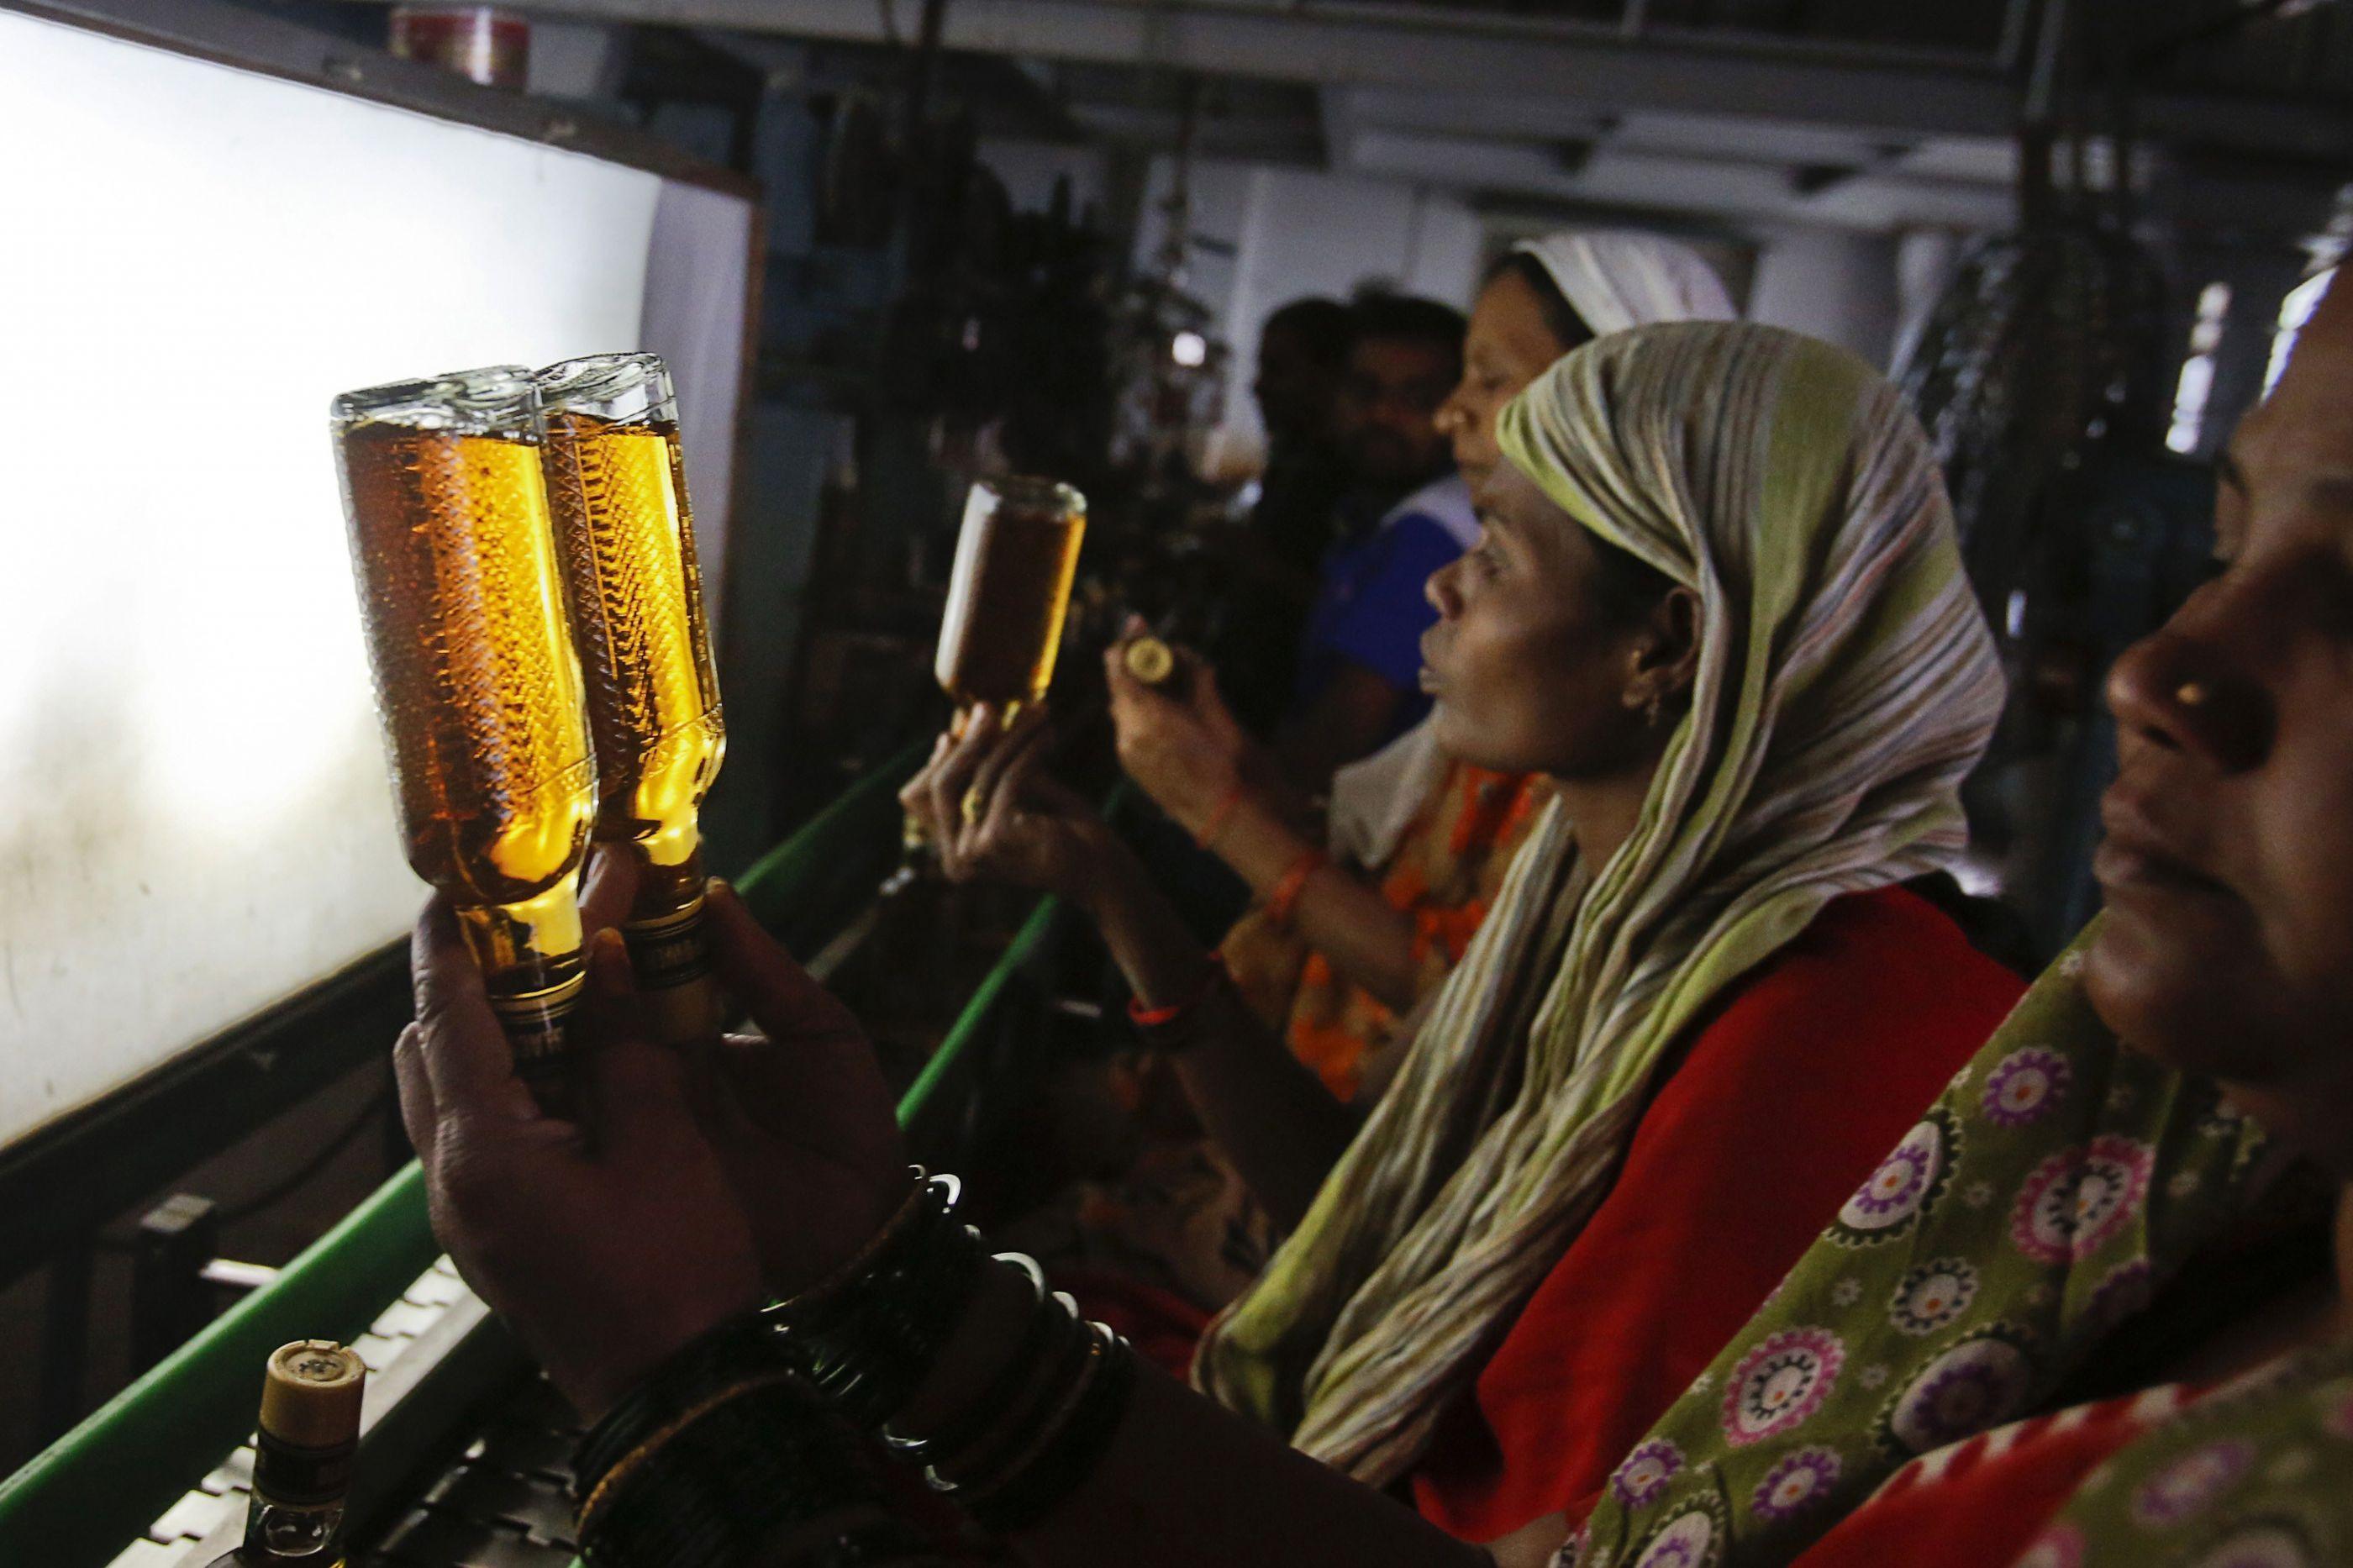 Cinquenta e dois mortos devido a consumo de álcool adulterado na Índia